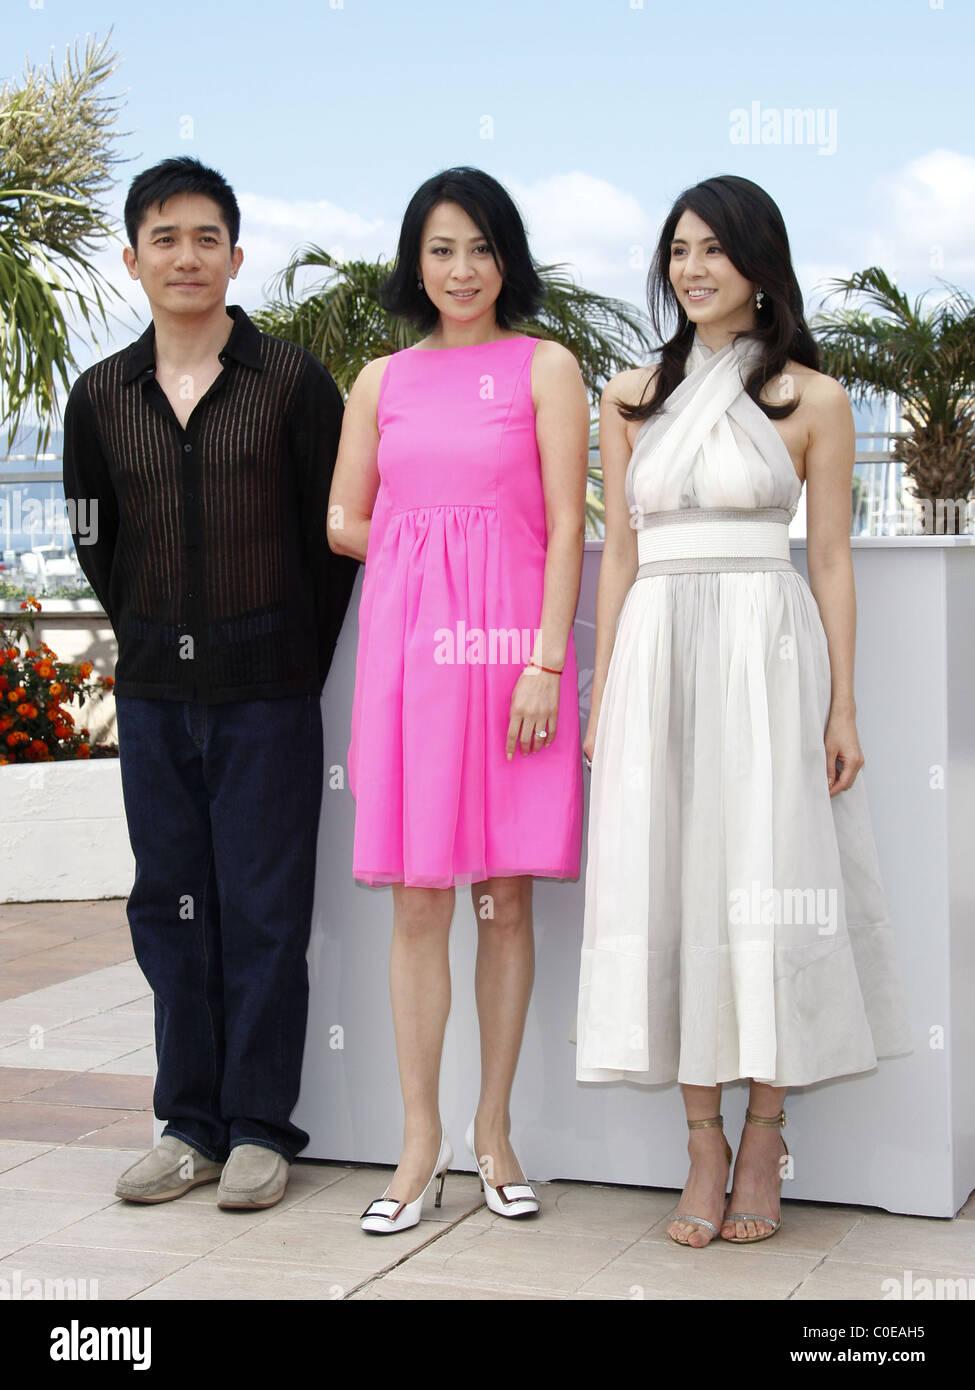 Robyn Gibbes,Vinaya Prasad Hot photo Jocelyn Lee (actress),Wendy Moniz